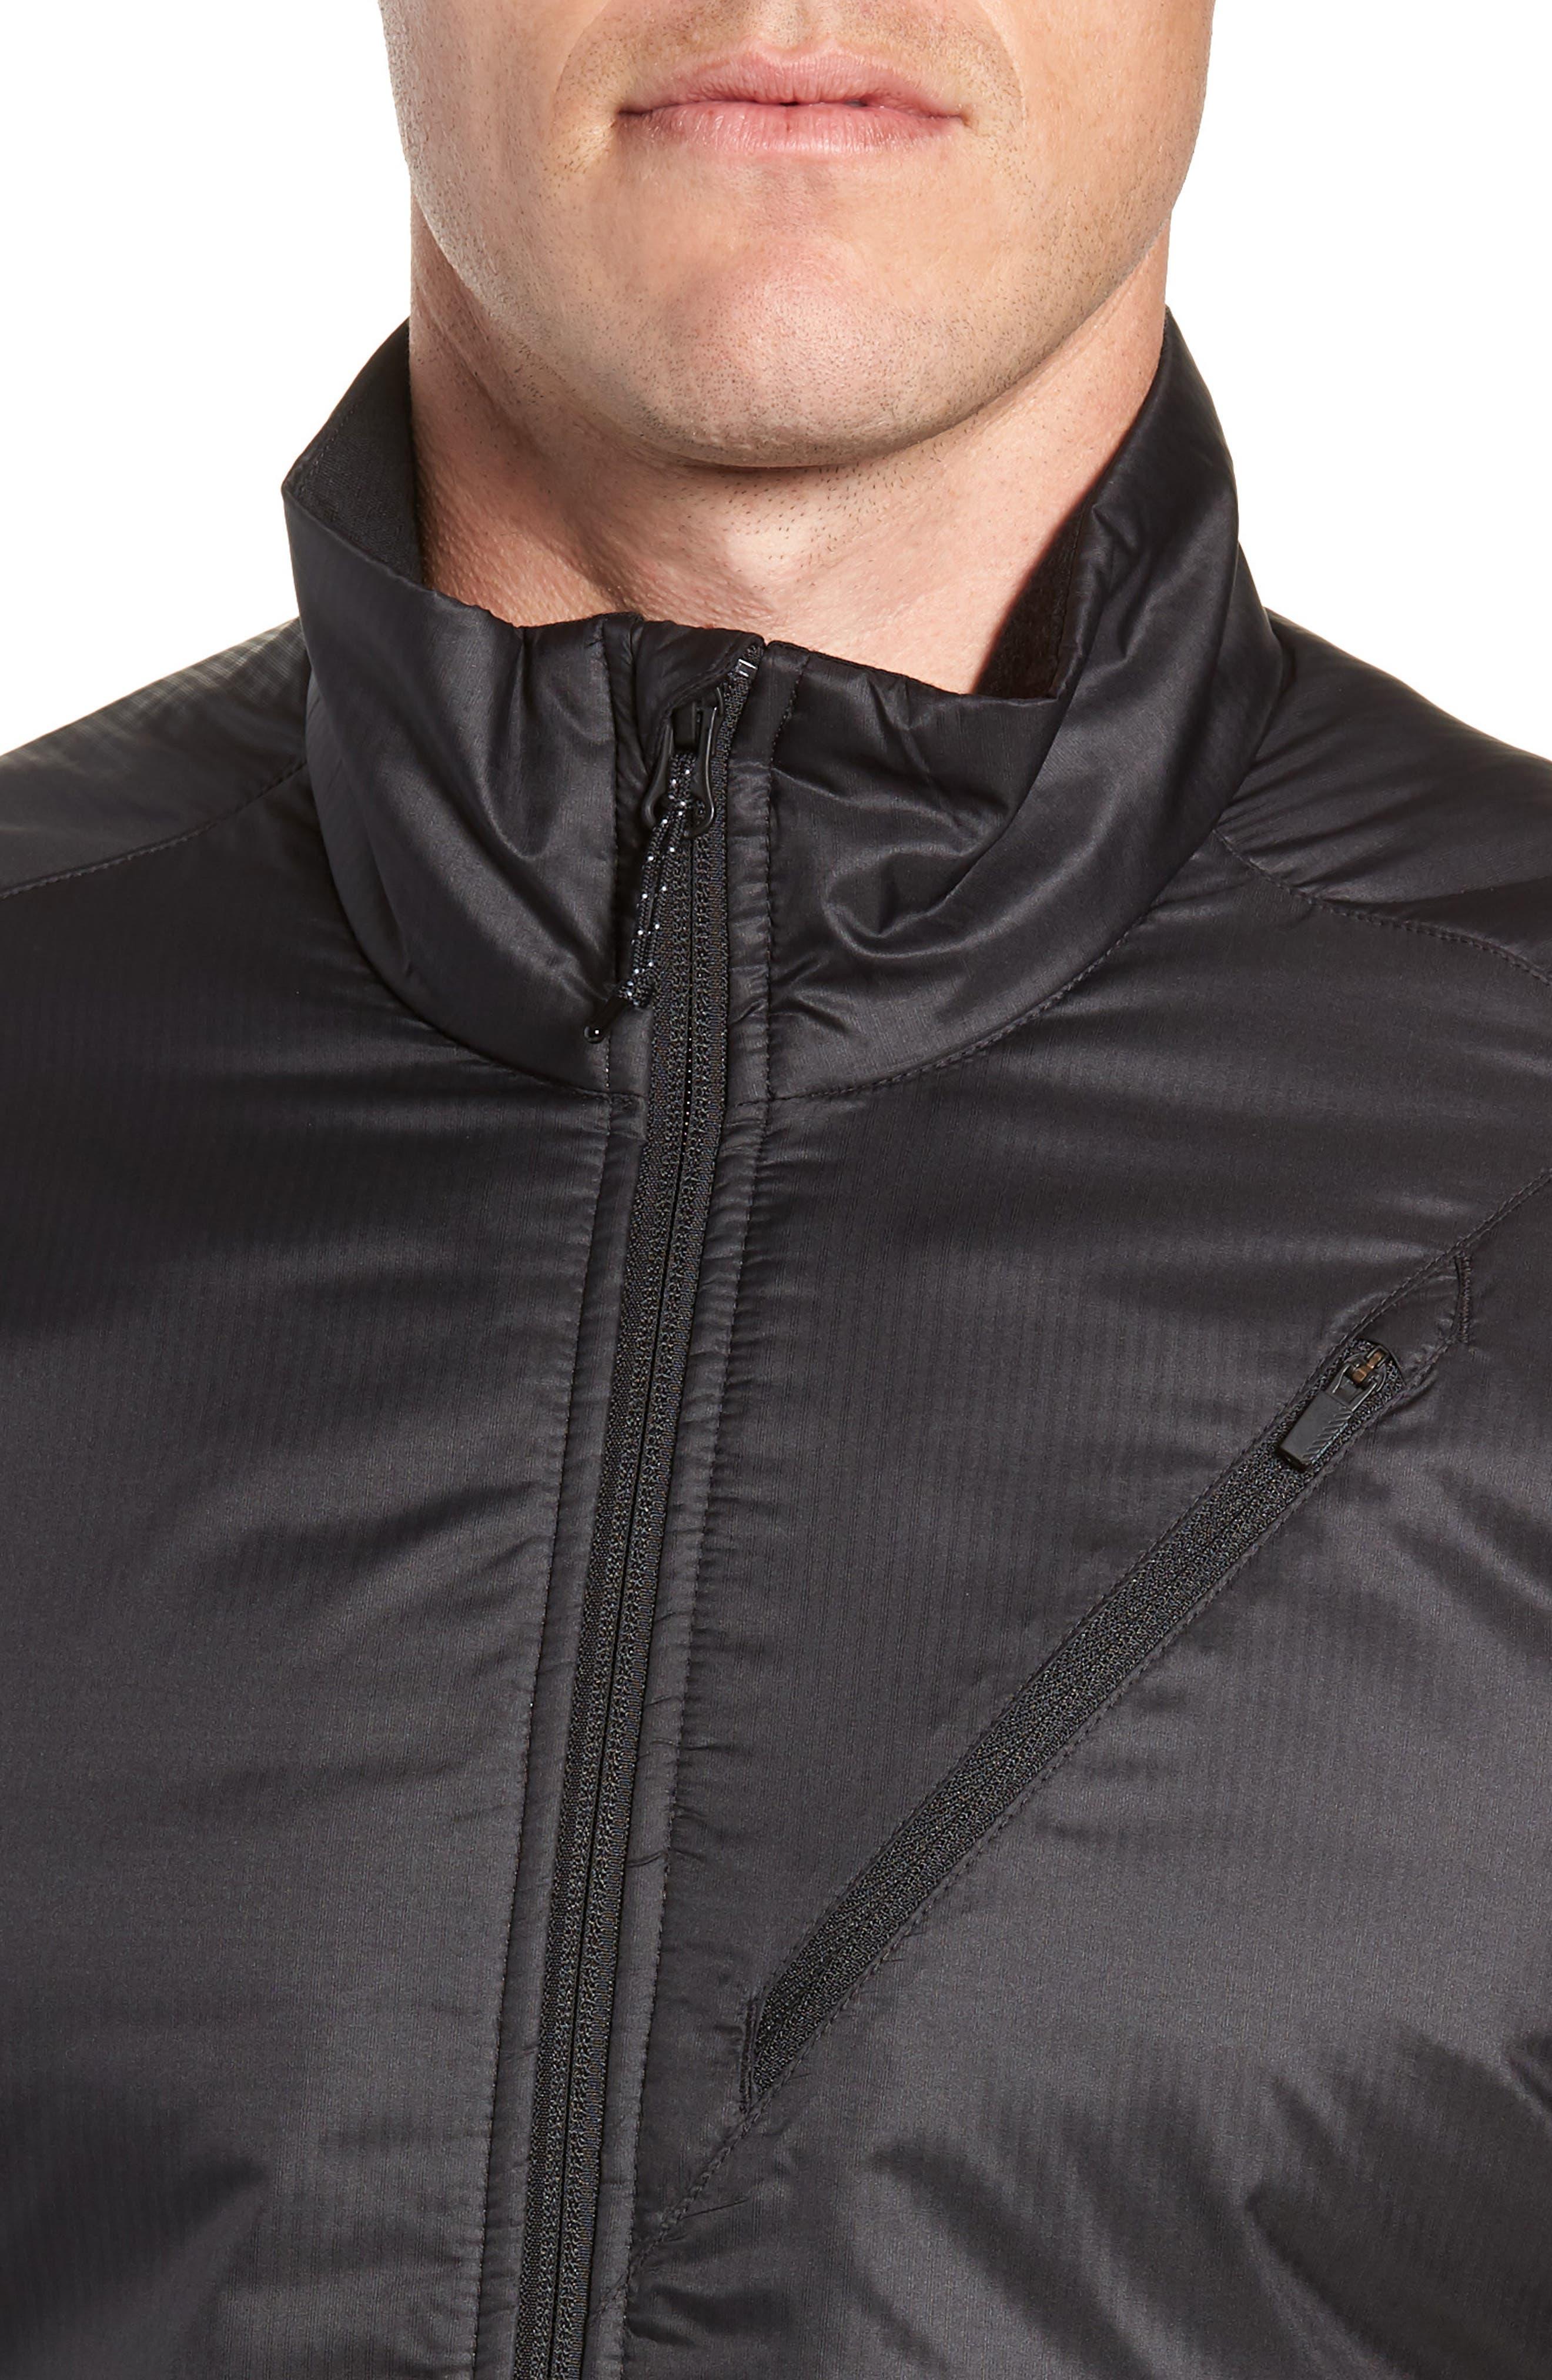 MerinoLOFT<sup>™</sup> Helix Midlayer Zip Jacket,                             Alternate thumbnail 4, color,                             BLACK/ JET HEATHER